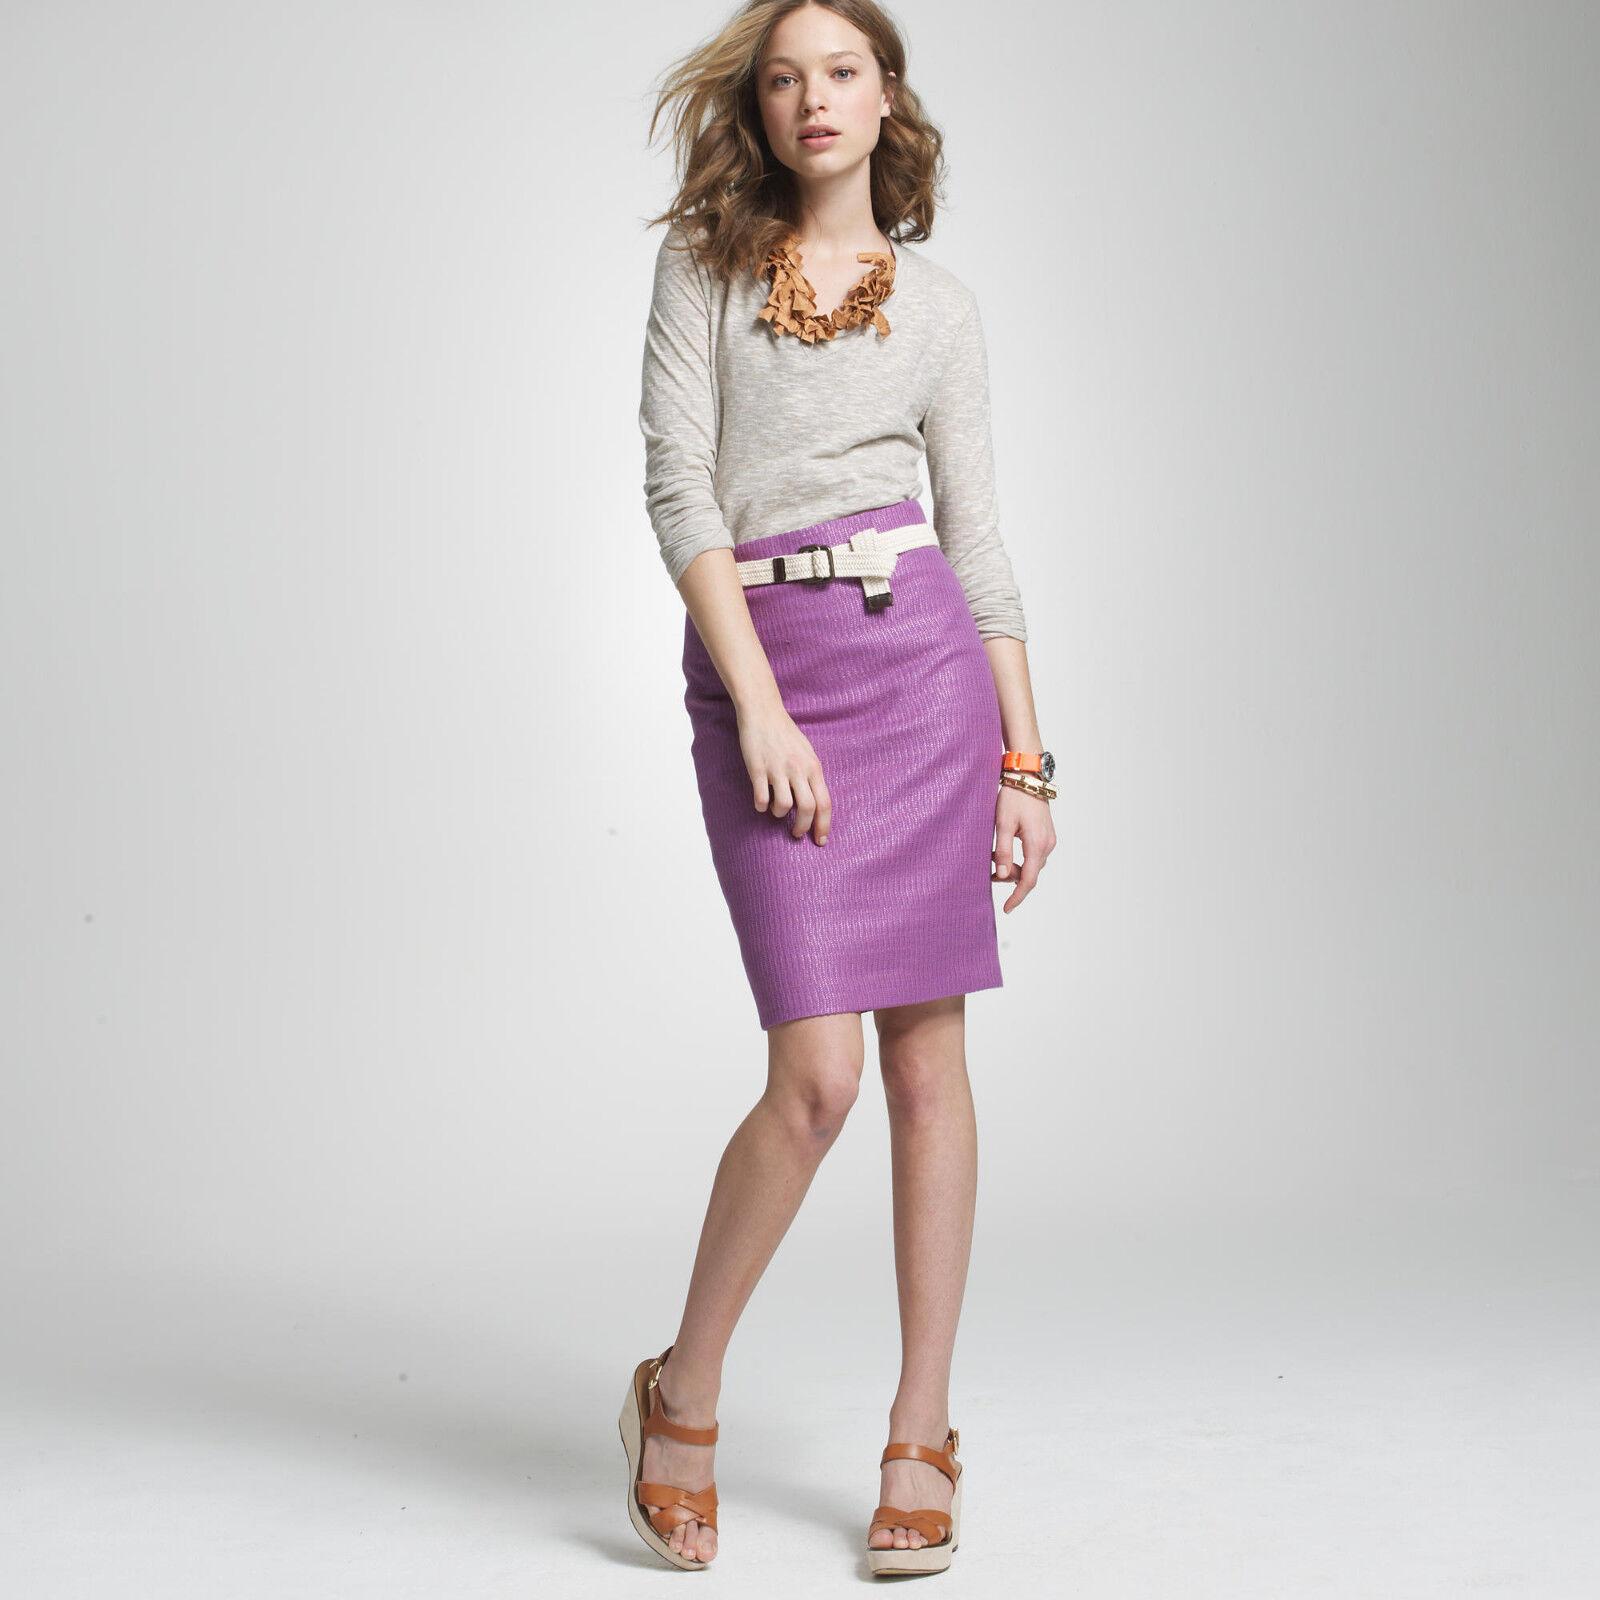 NWT J.Crew Cotten-blend 'Unagi Tweed Pencil Skirt' 8